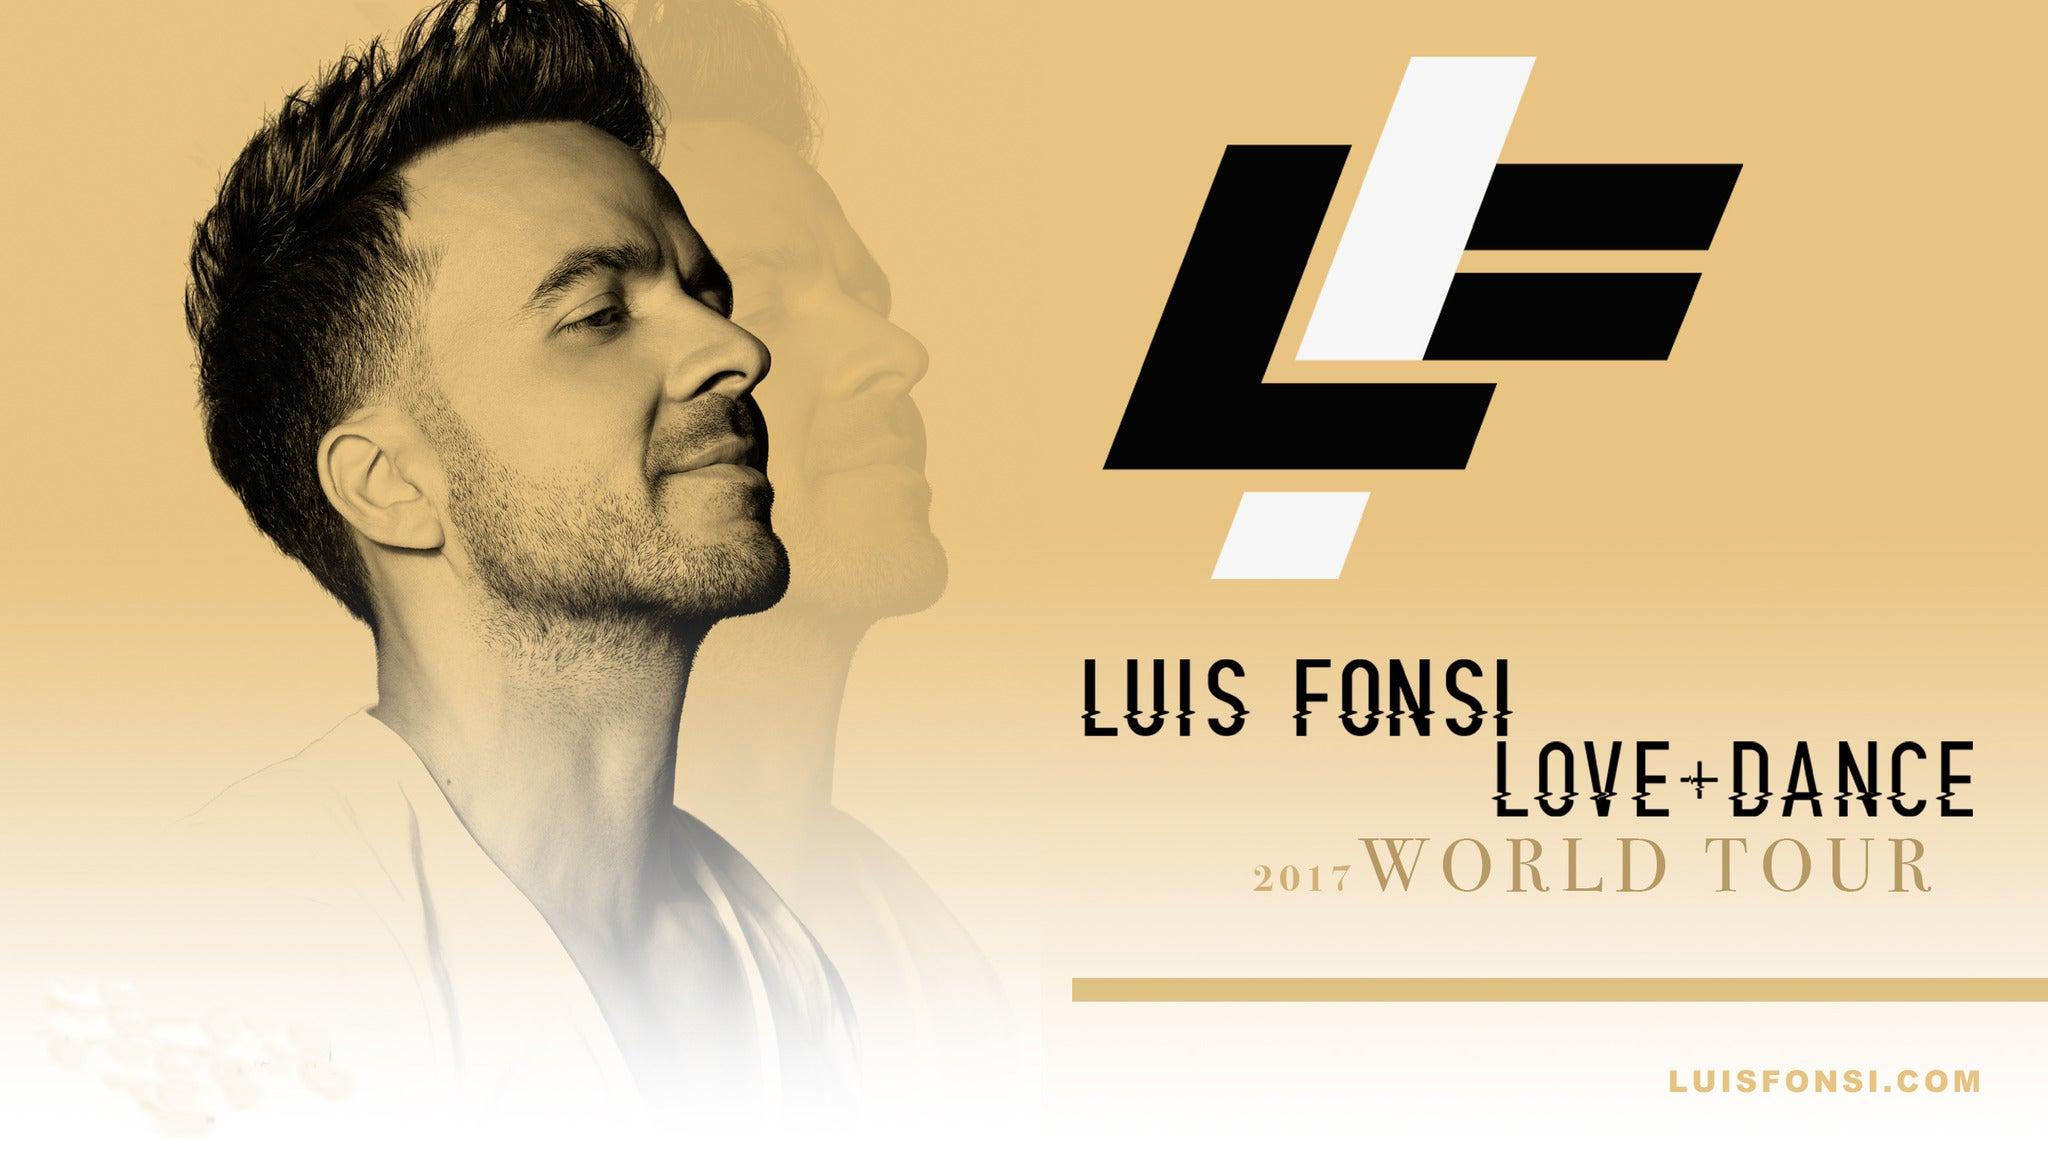 Luis Fonsi Love + Dance World Tour at Rosemont Theatre